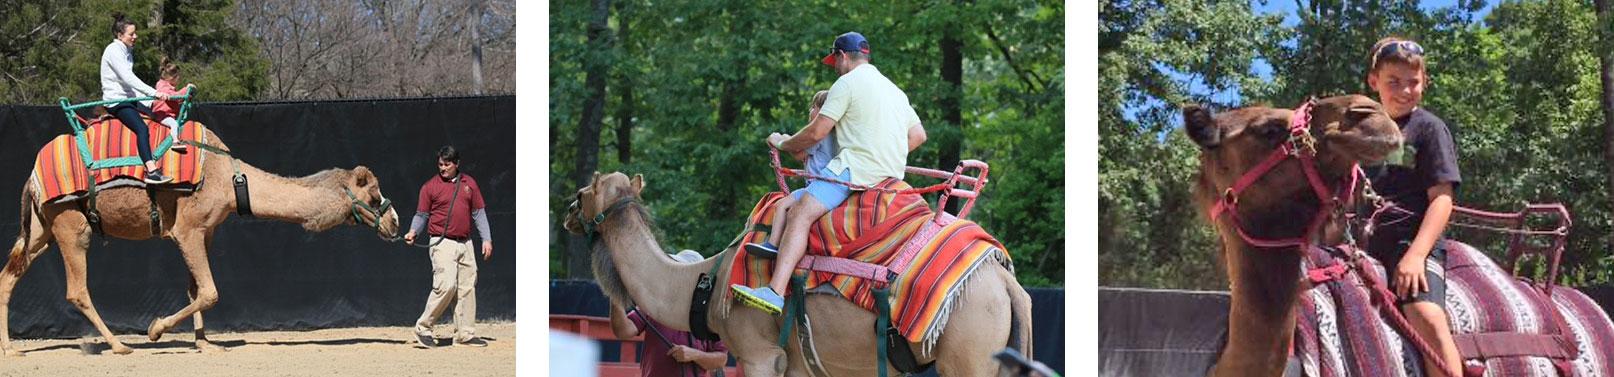 Camel rides bottom banner